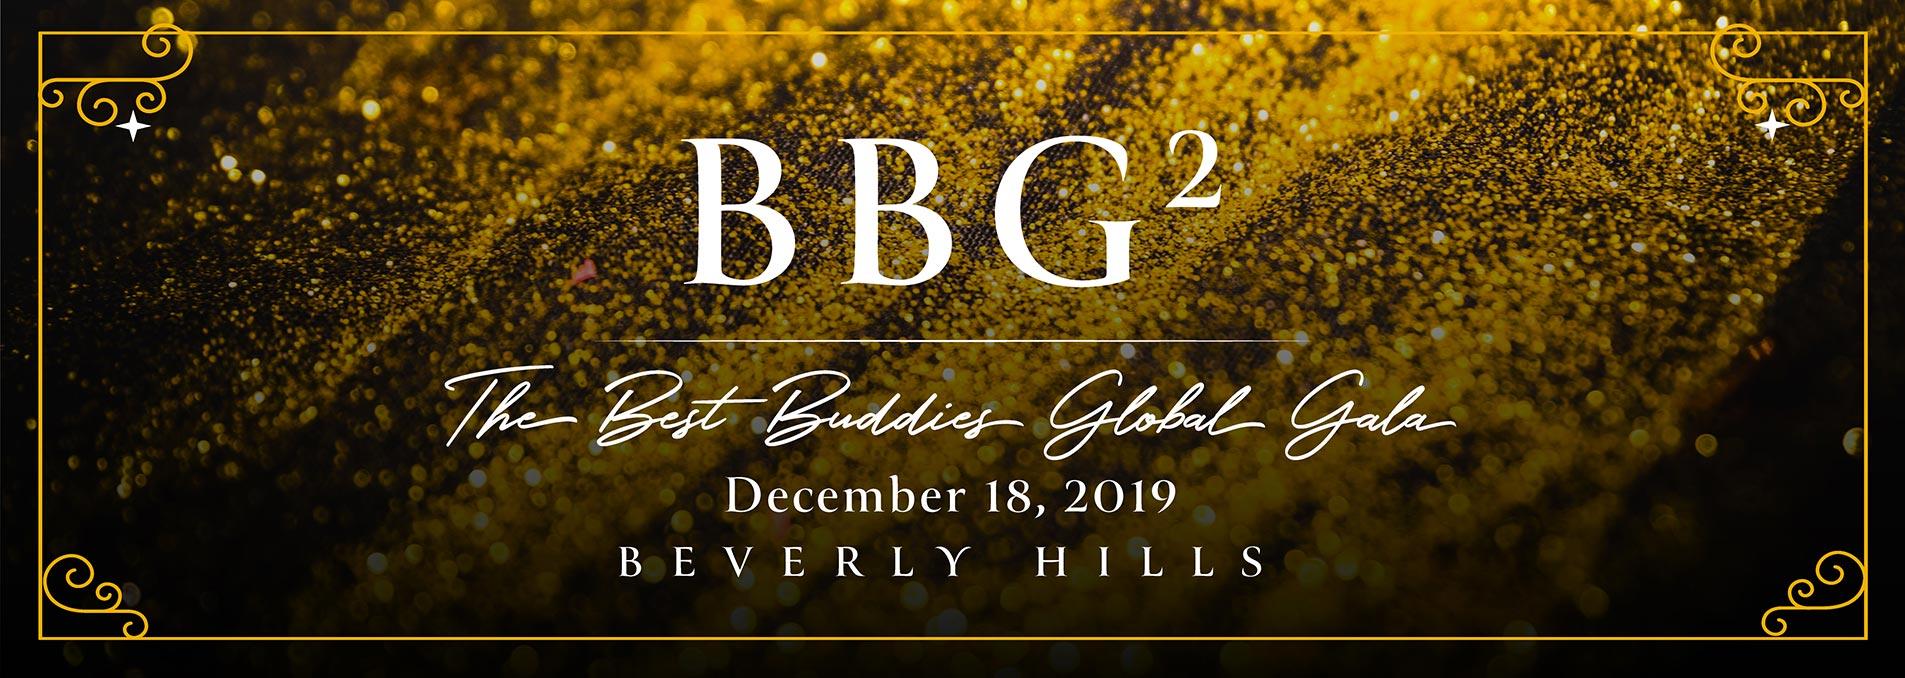 Best Buddies Global Gala - Beverly Hills Banner